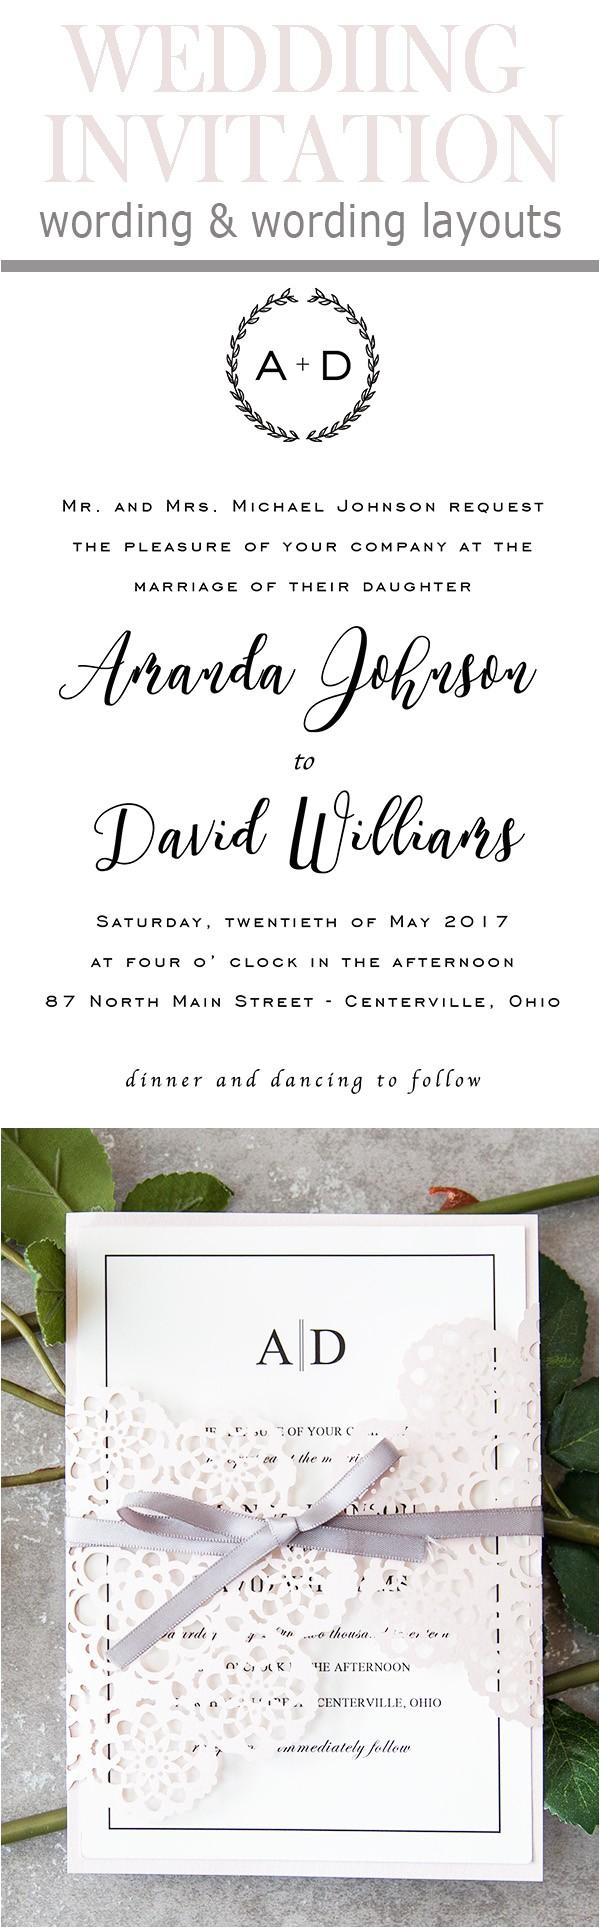 Common Wedding Invitation Wording 20 Popular Wedding Invitation Wording Diy Templates Ideas